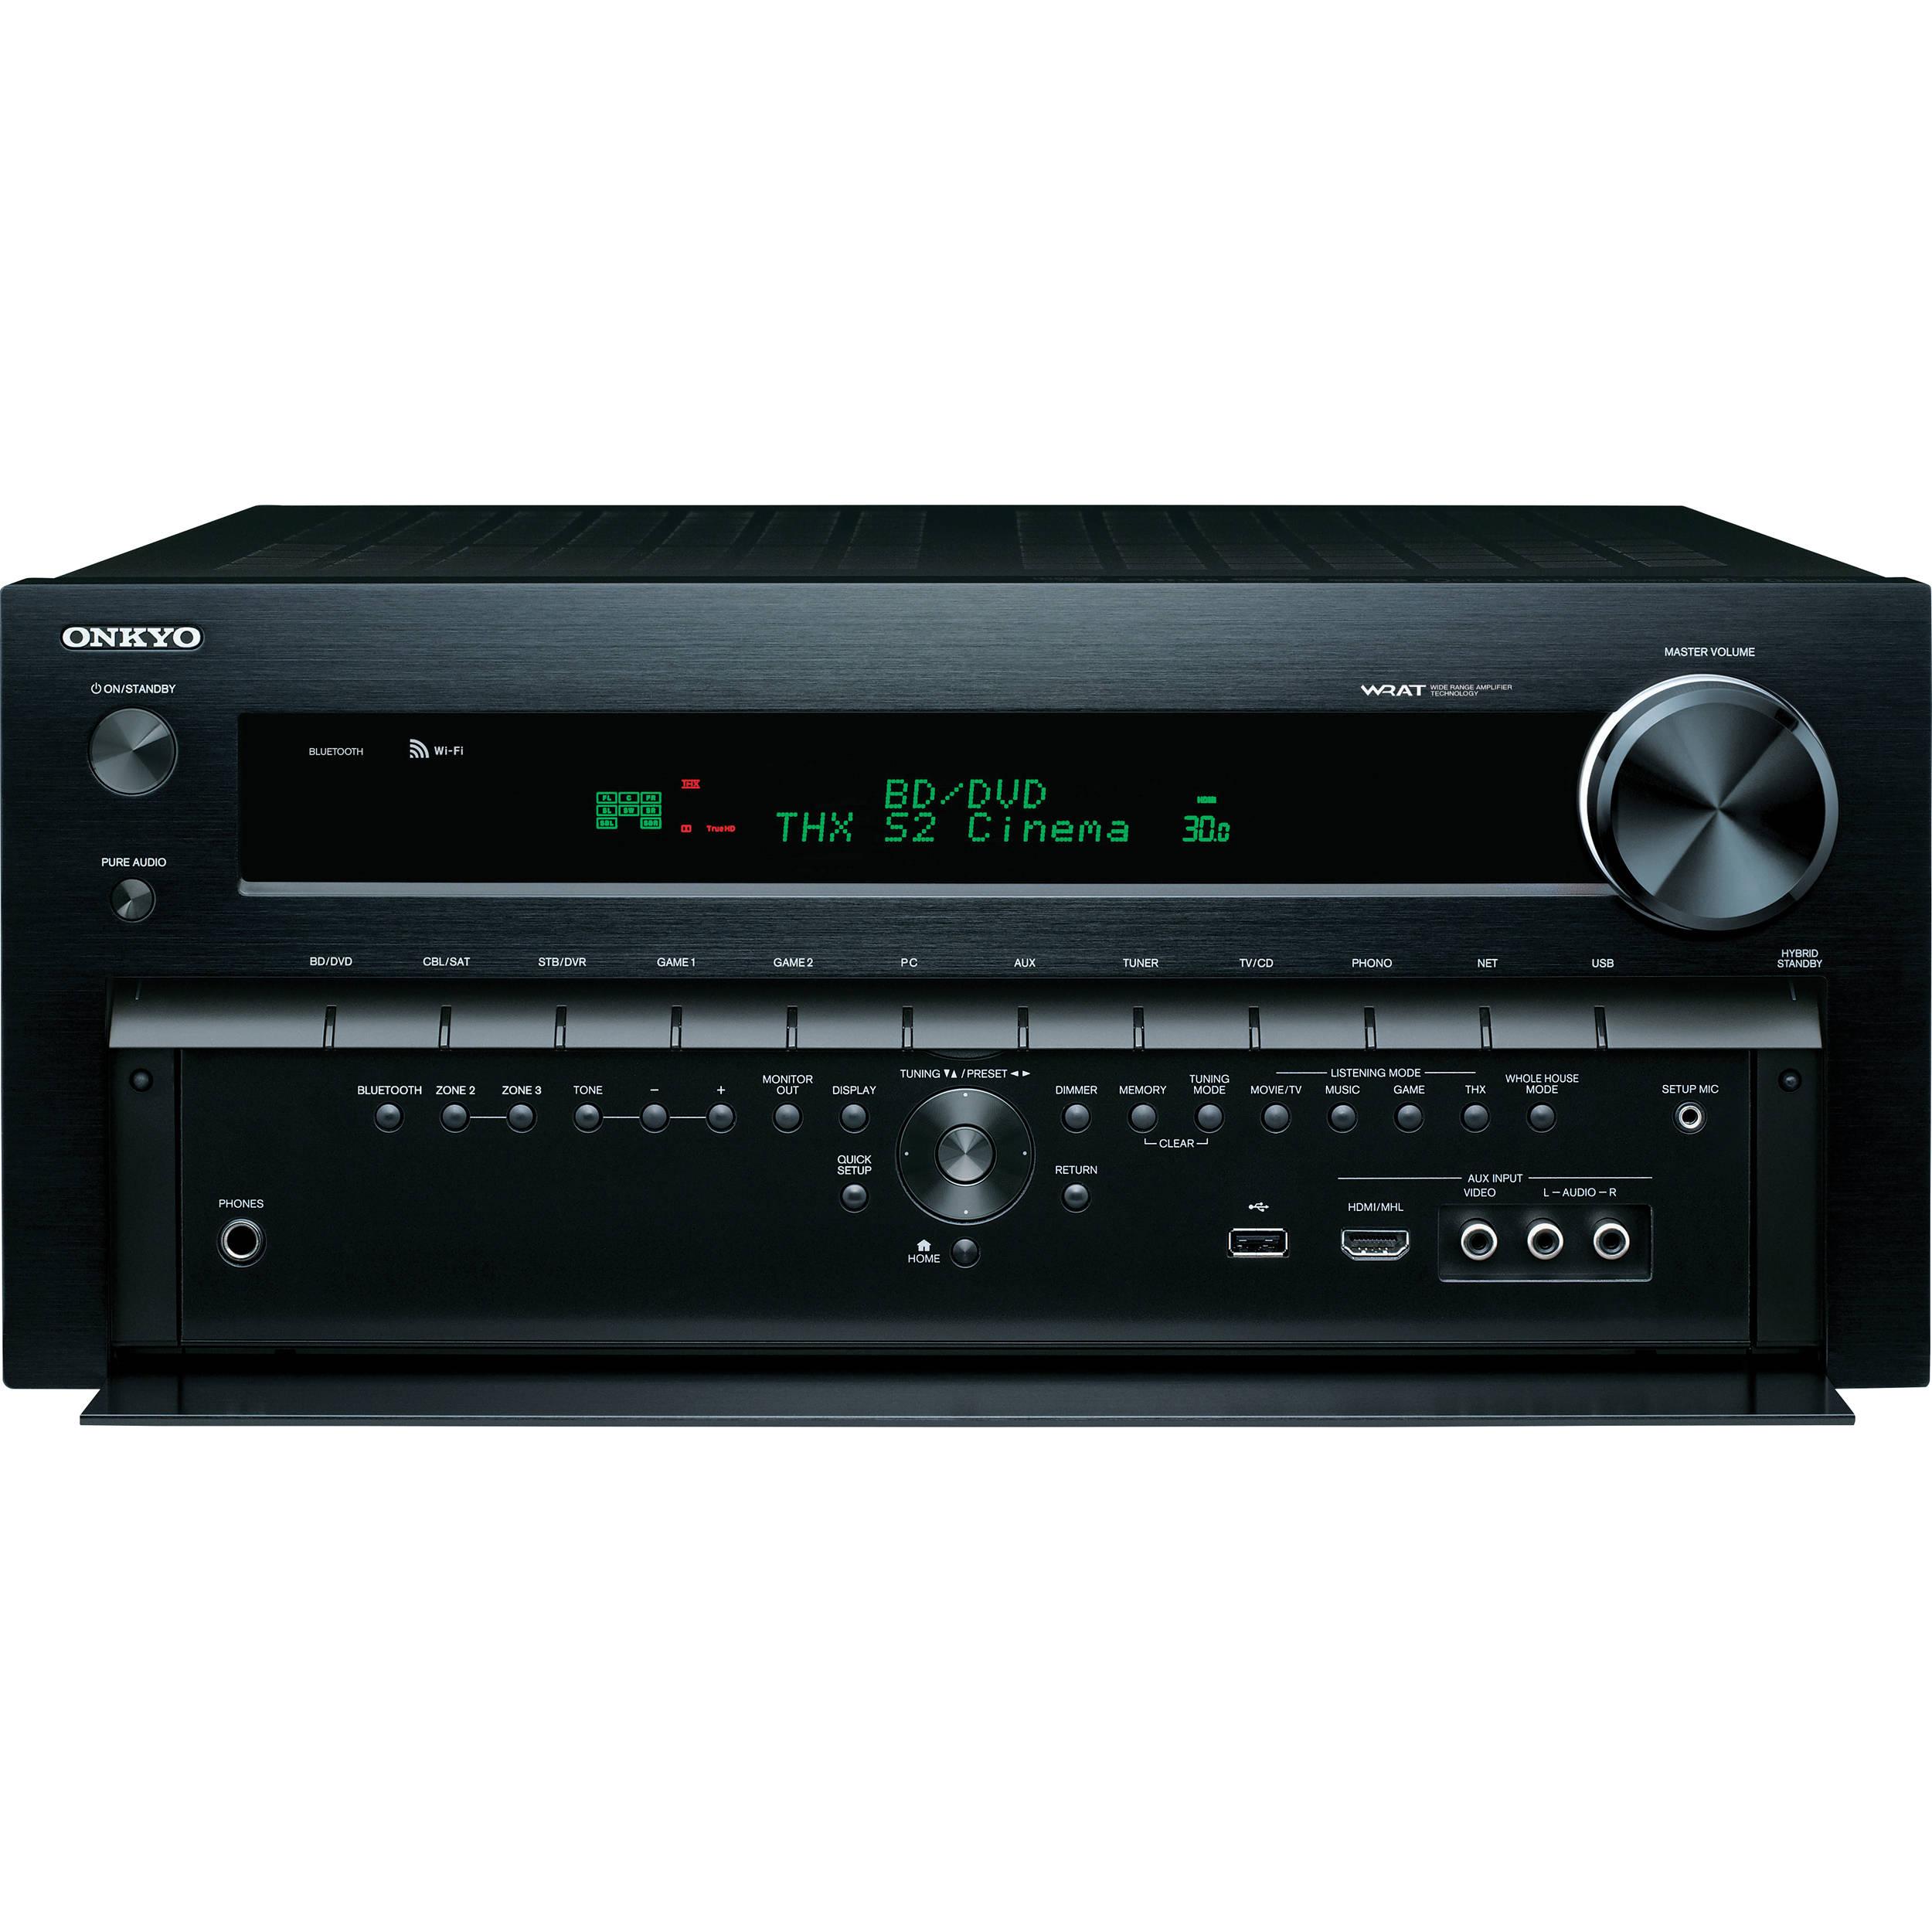 Onkyo TX-NR828 7 2-Channel Network A/V Receiver